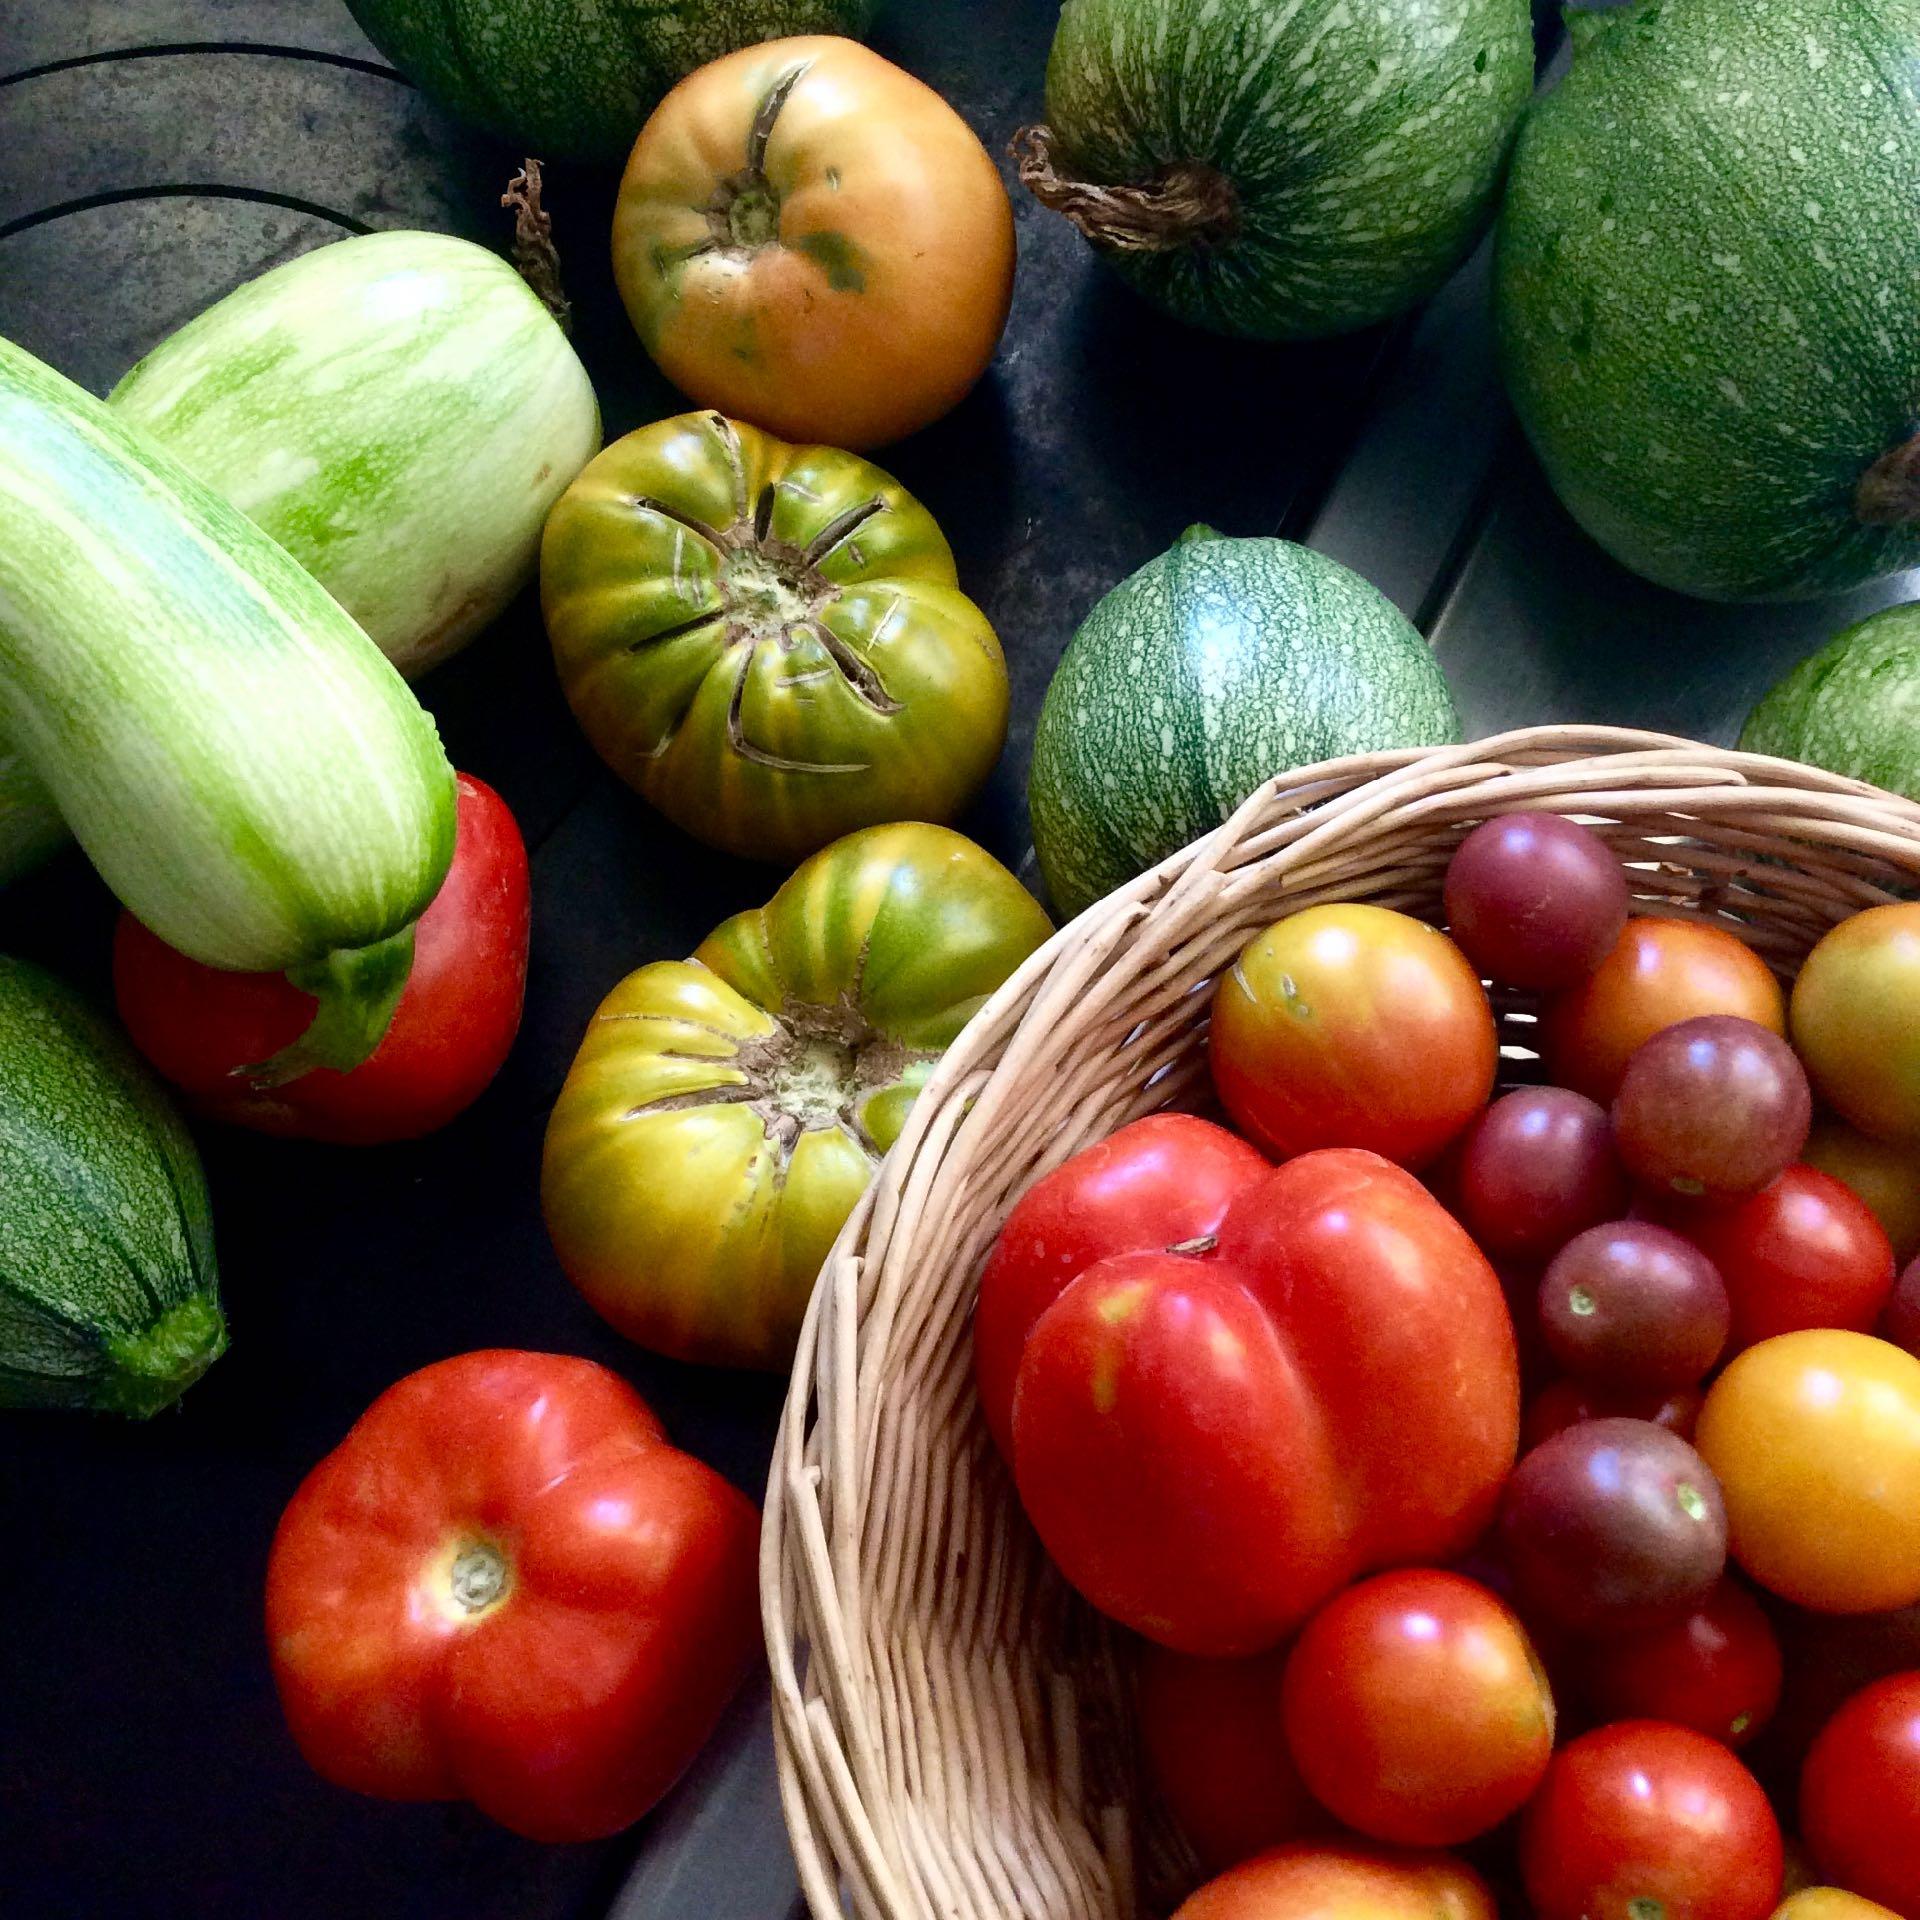 Vegetables from our kitchen garden